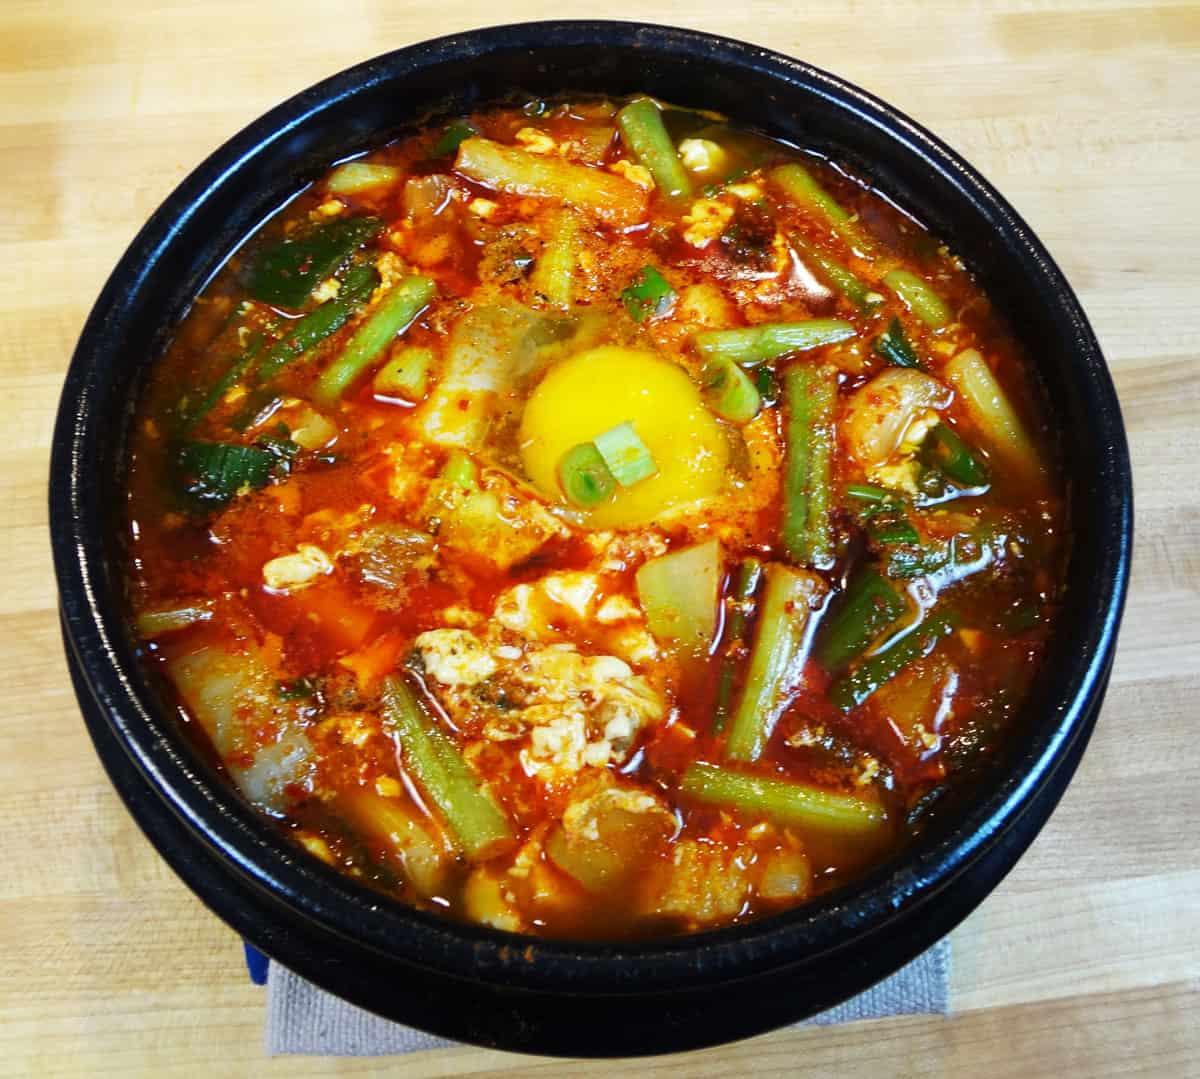 Haemul Sundubu Jjigae Spicy Soft Tofu Stew With Seafood Recipe Maangchi Com